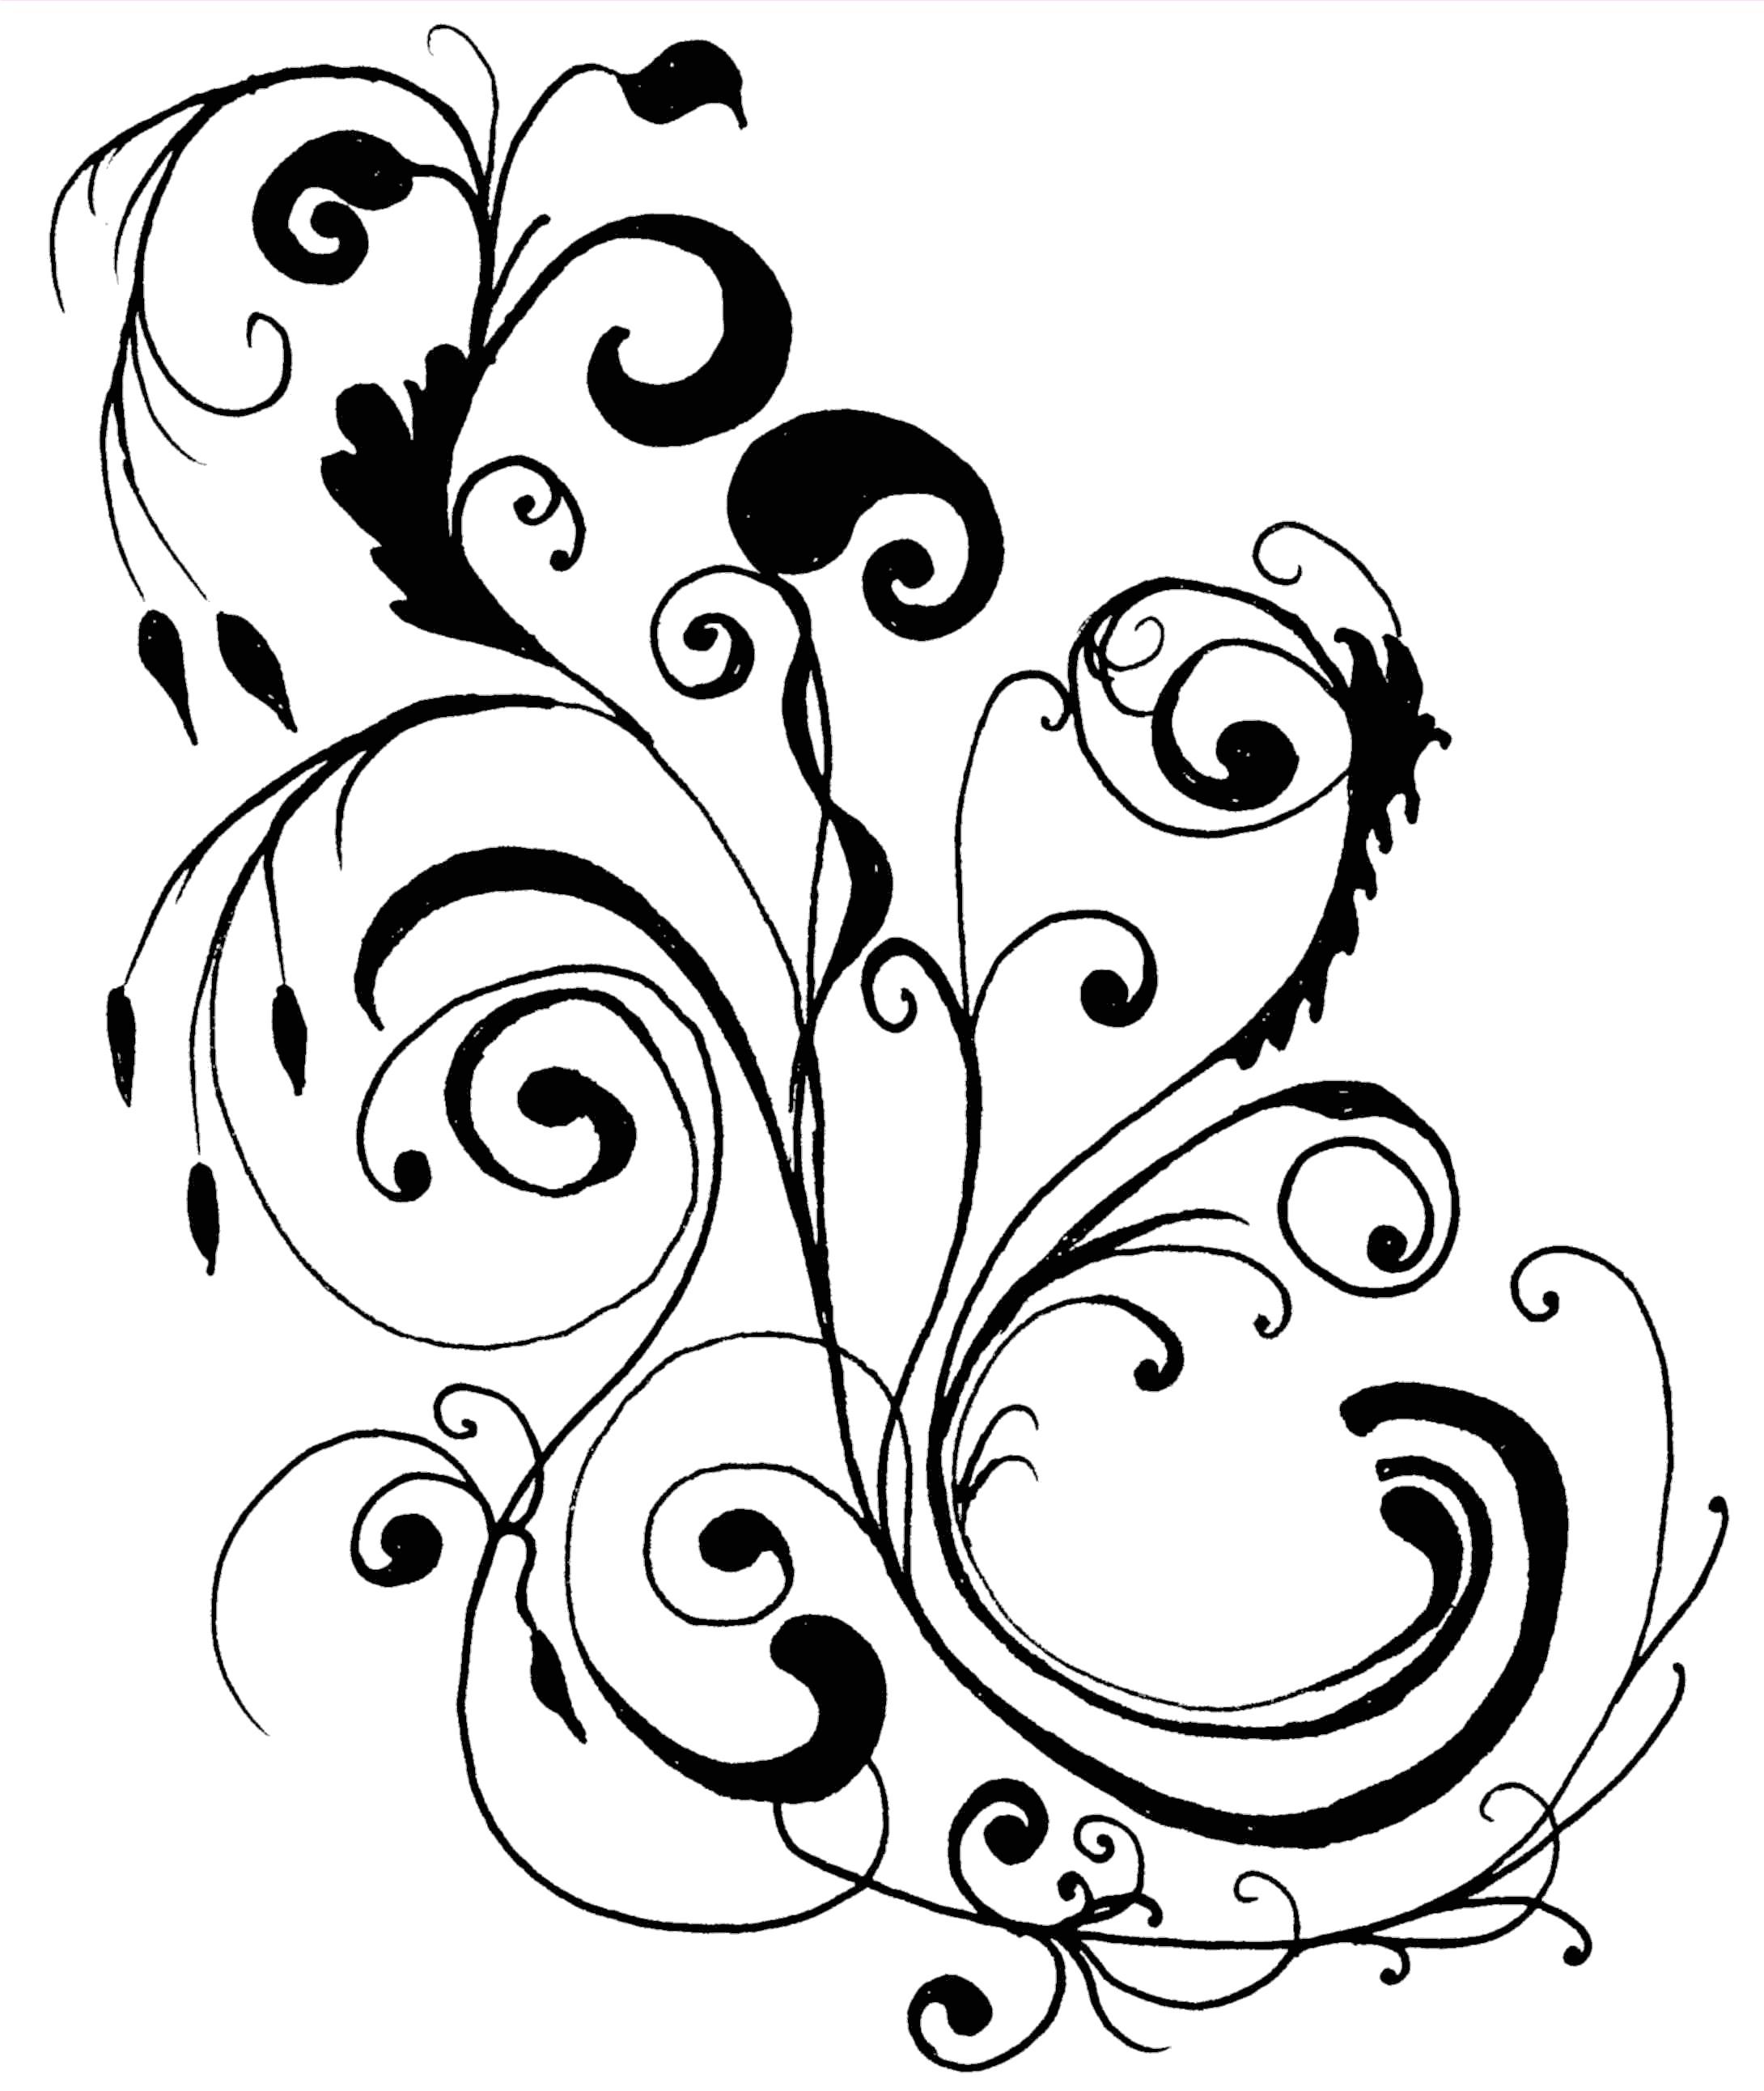 Clipart Designs